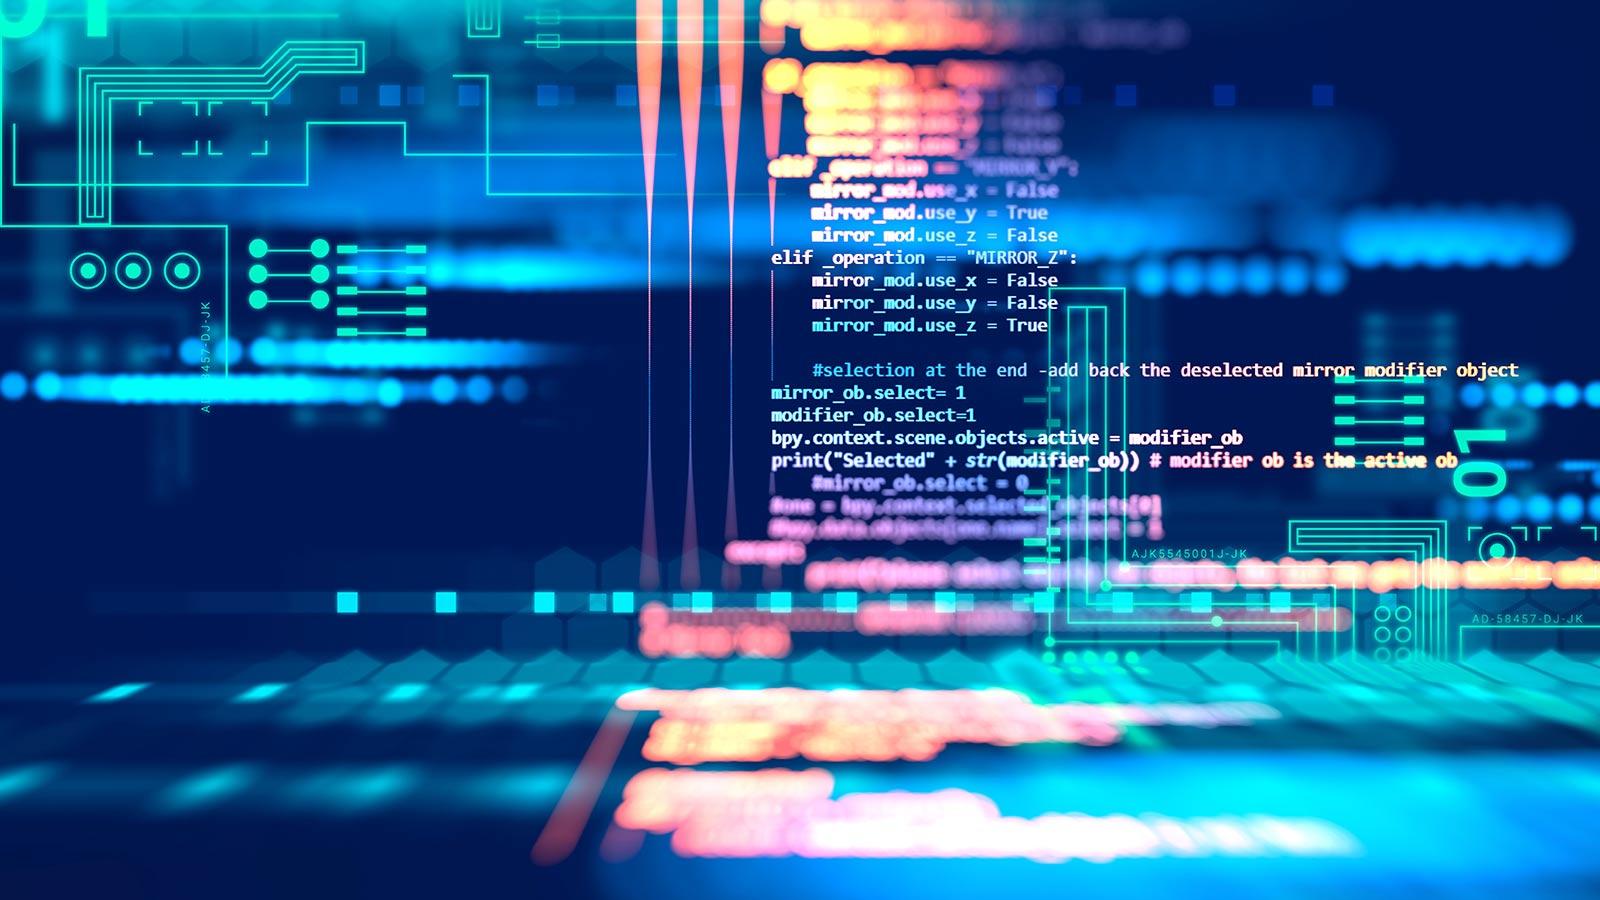 software engineering technology security data future spells development architects bitdefender innovation imec wall agencies prepare custom microsoft backgrounds sci maturity